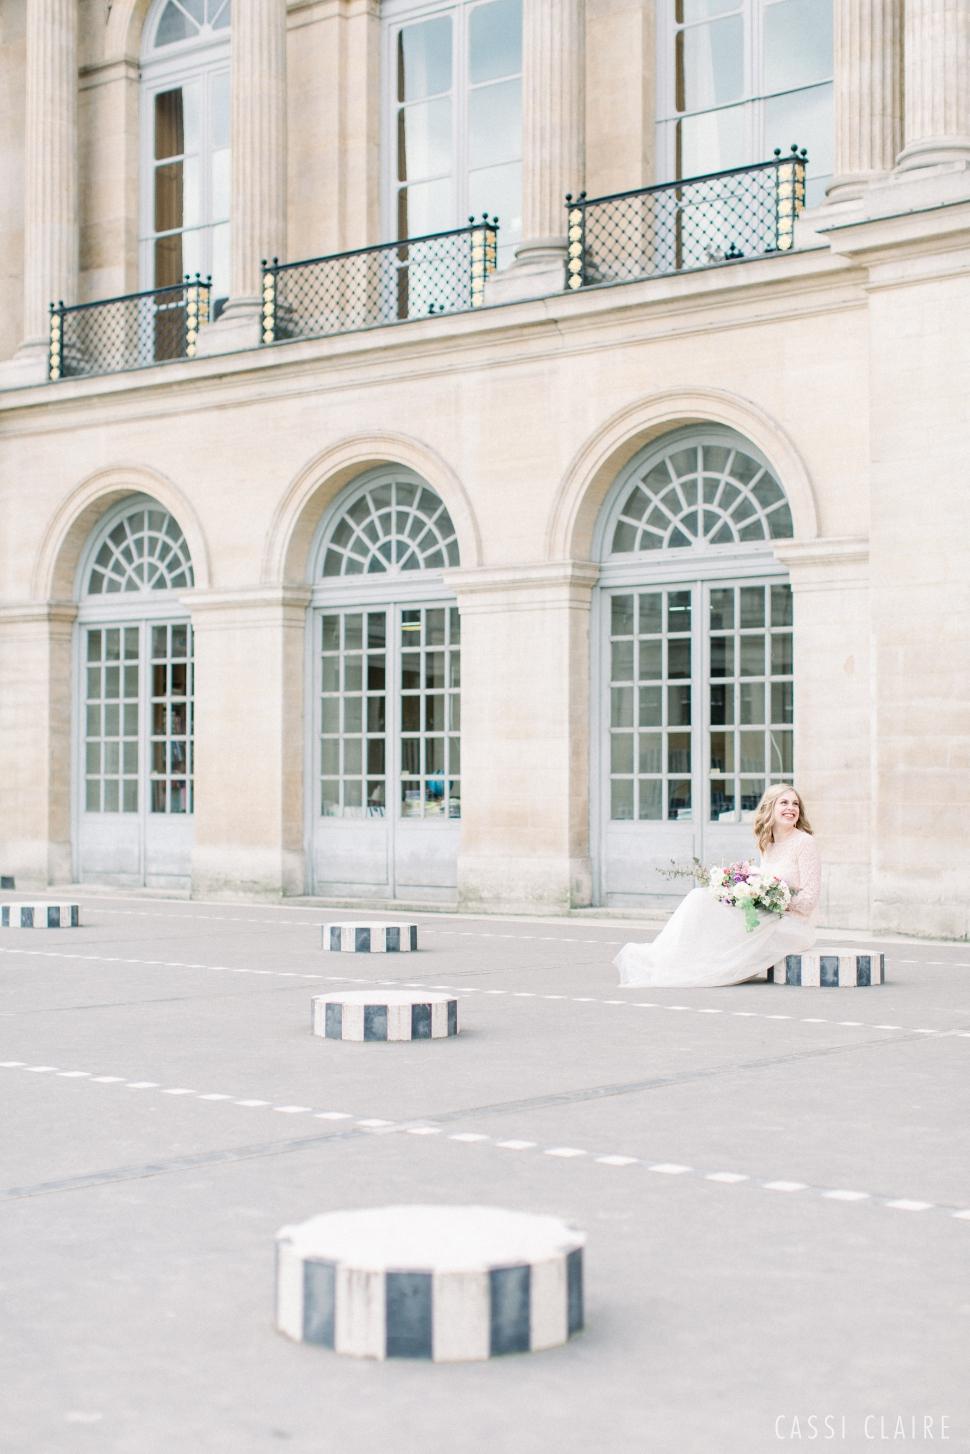 Paris-France-Wedding_CassiClaire_19.jpg